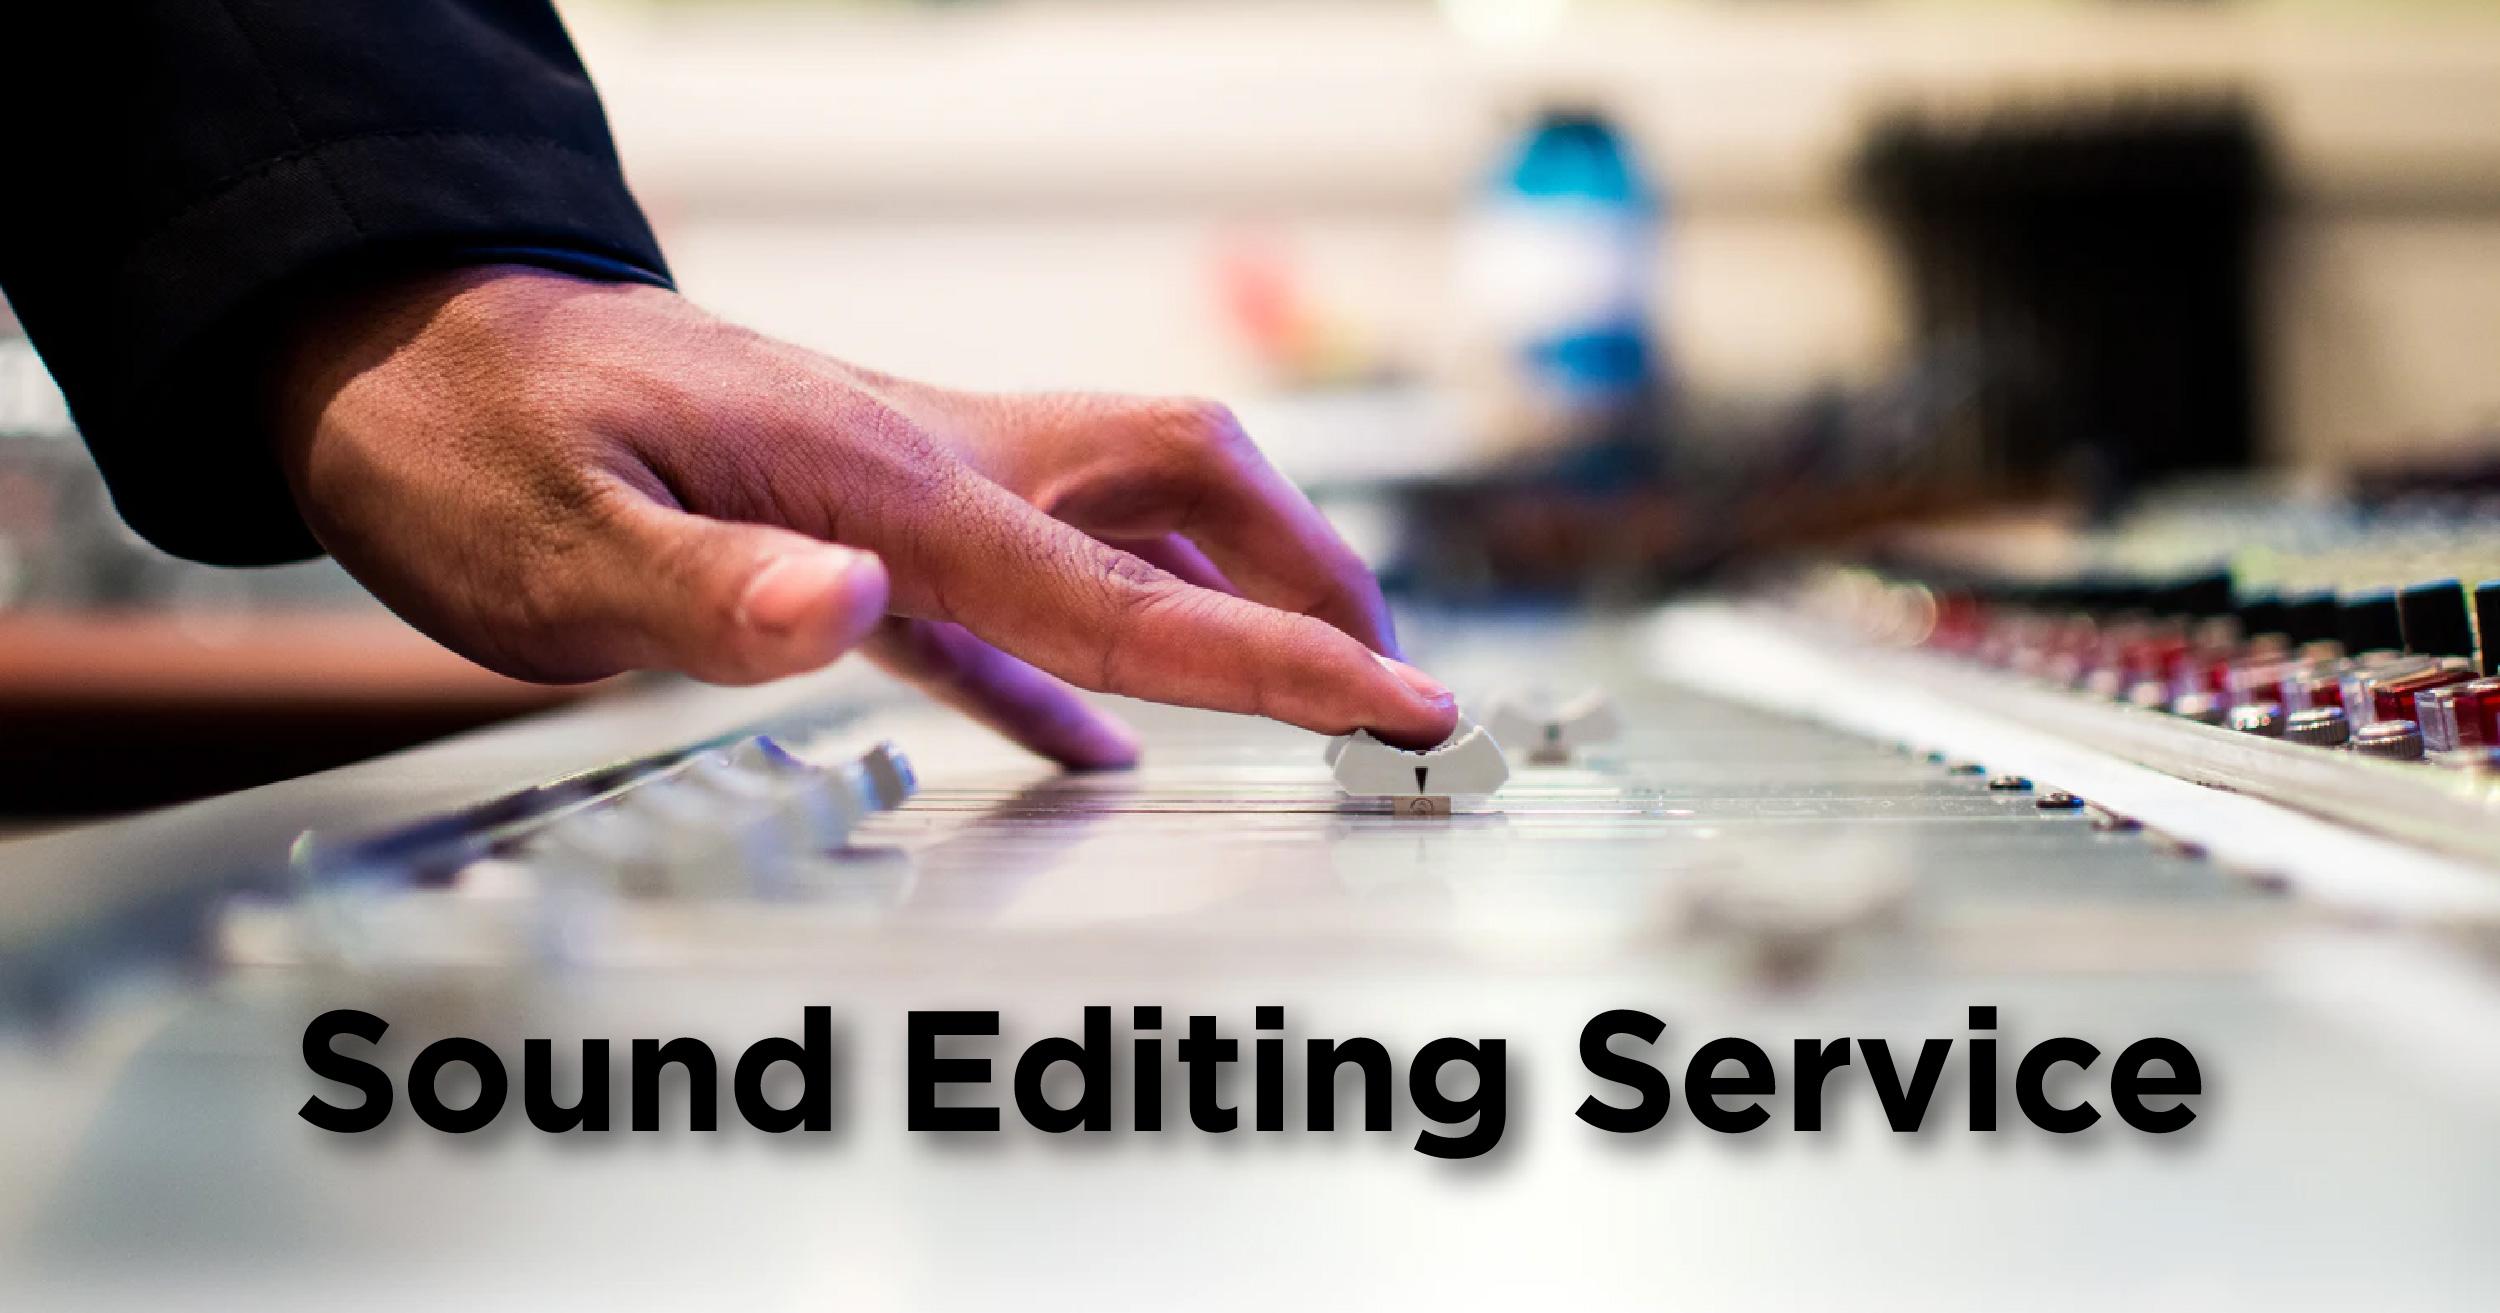 Sound editing service